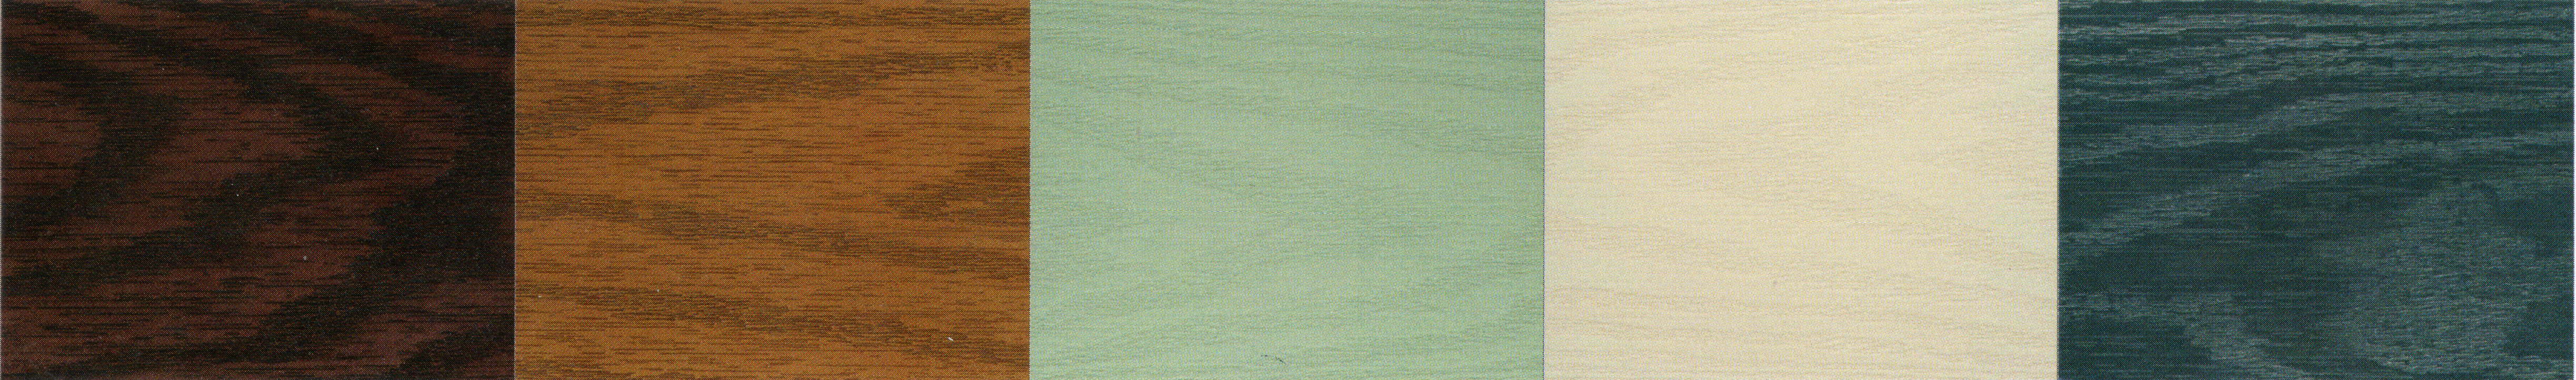 composite door colours chestnut, oak, green, cream and blue